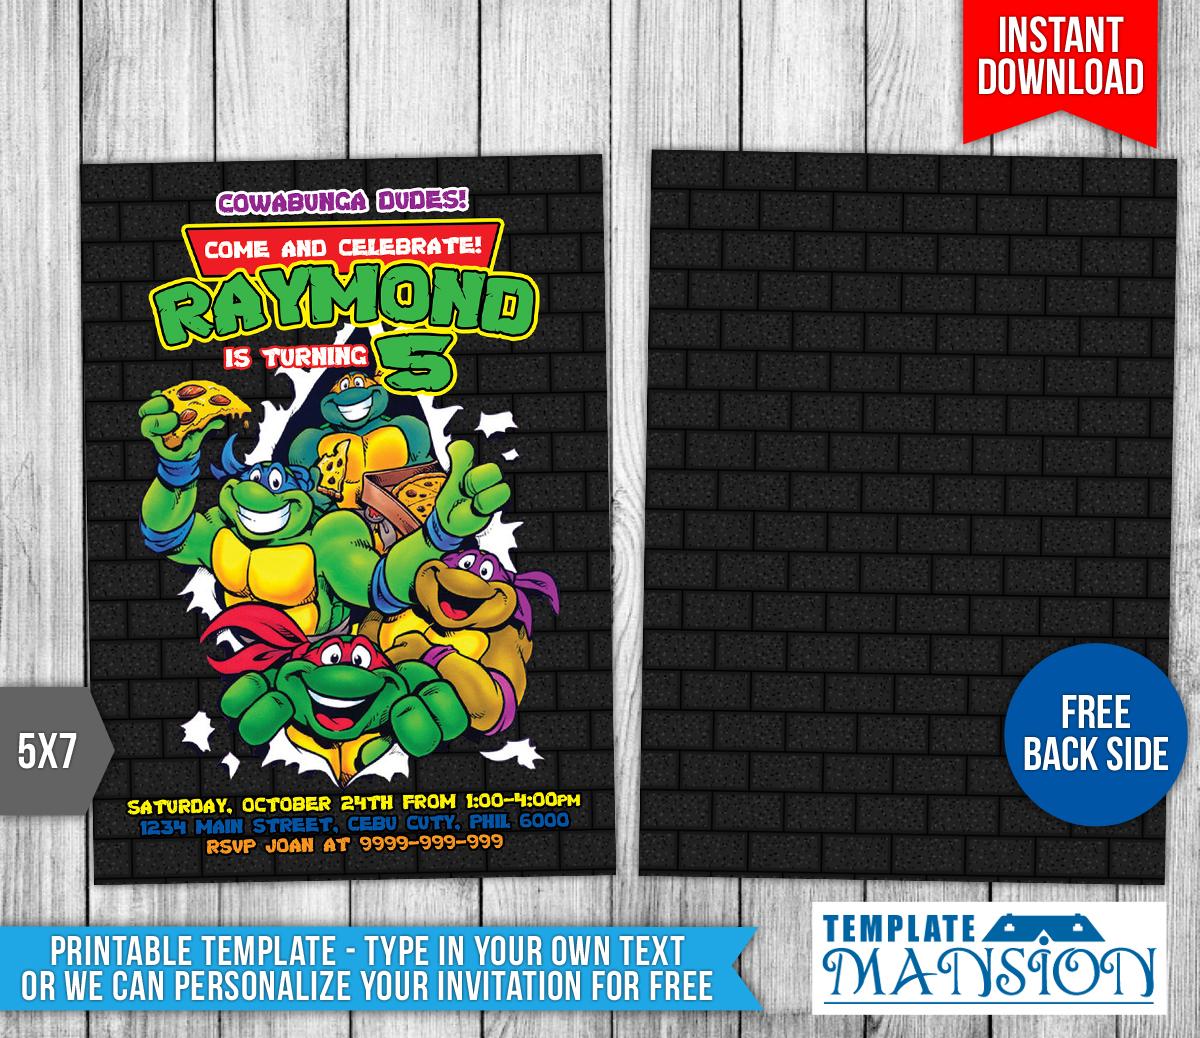 Teenage mutant ninja turtles birthday invitation t by teenage mutant ninja turtles birthday invitation t by templatemansion stopboris Image collections